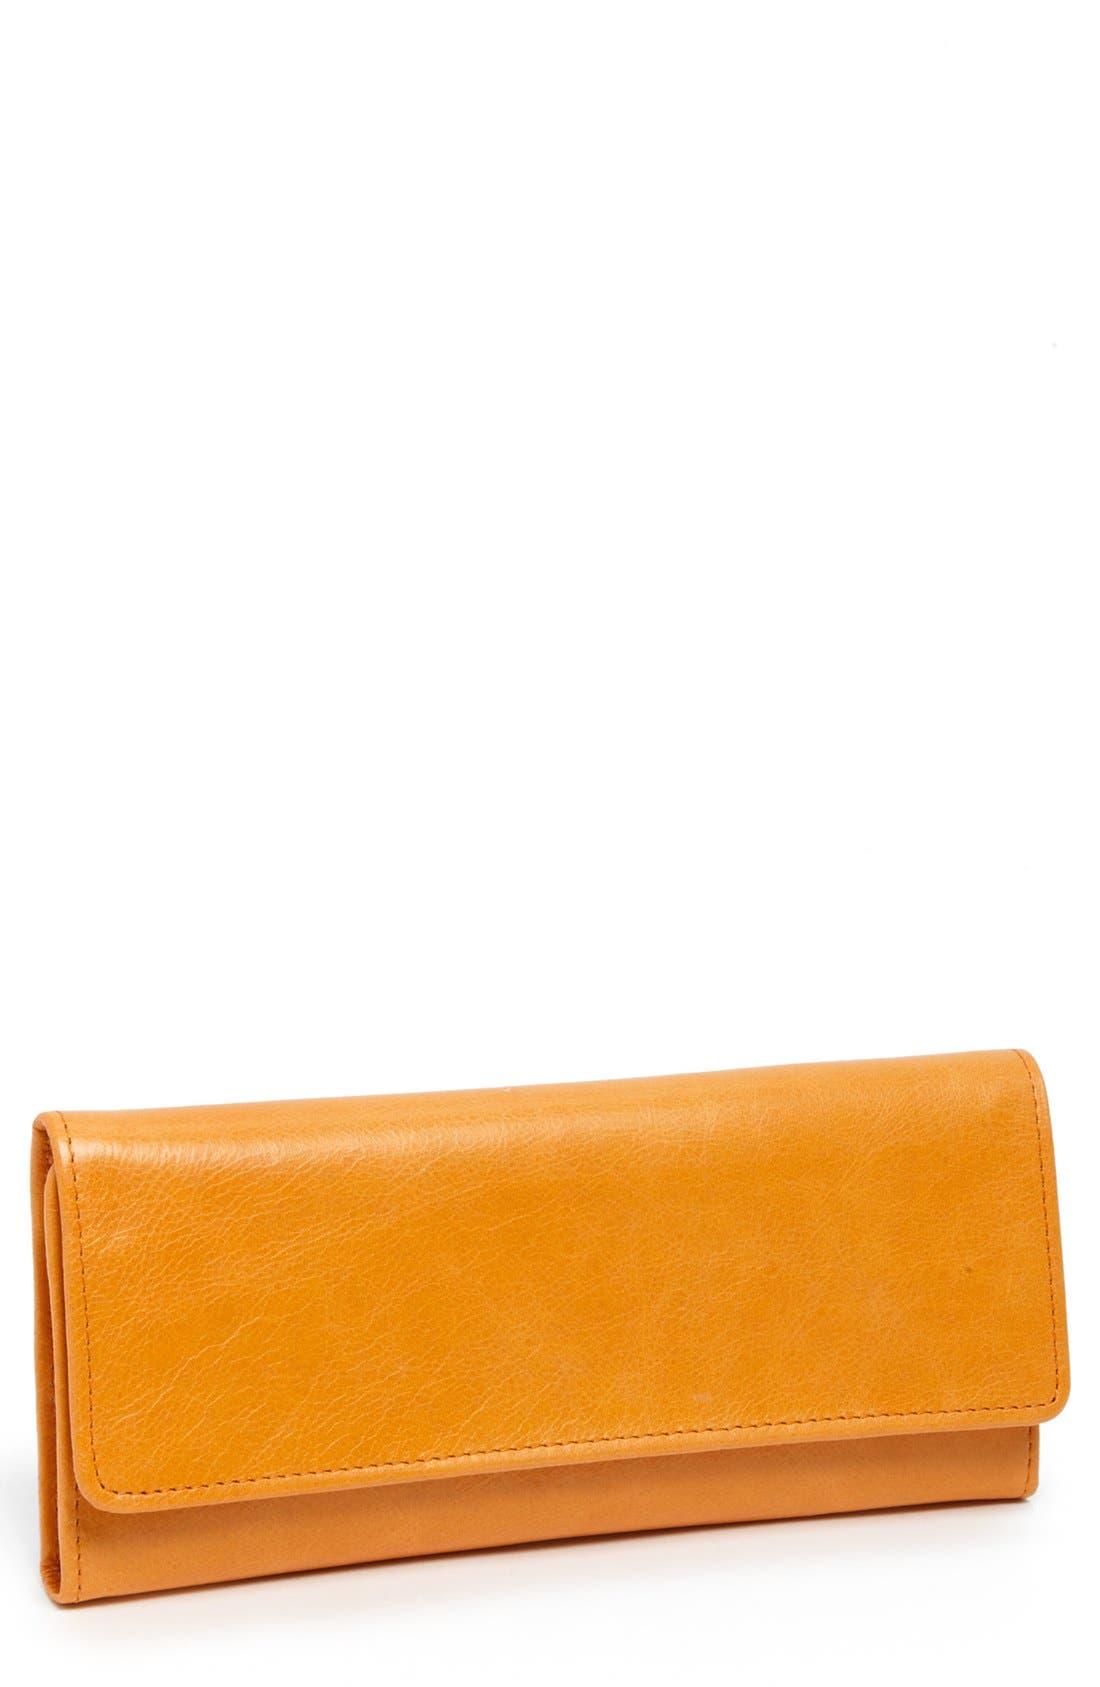 'Sadie' Leather Wallet,                             Main thumbnail 67, color,